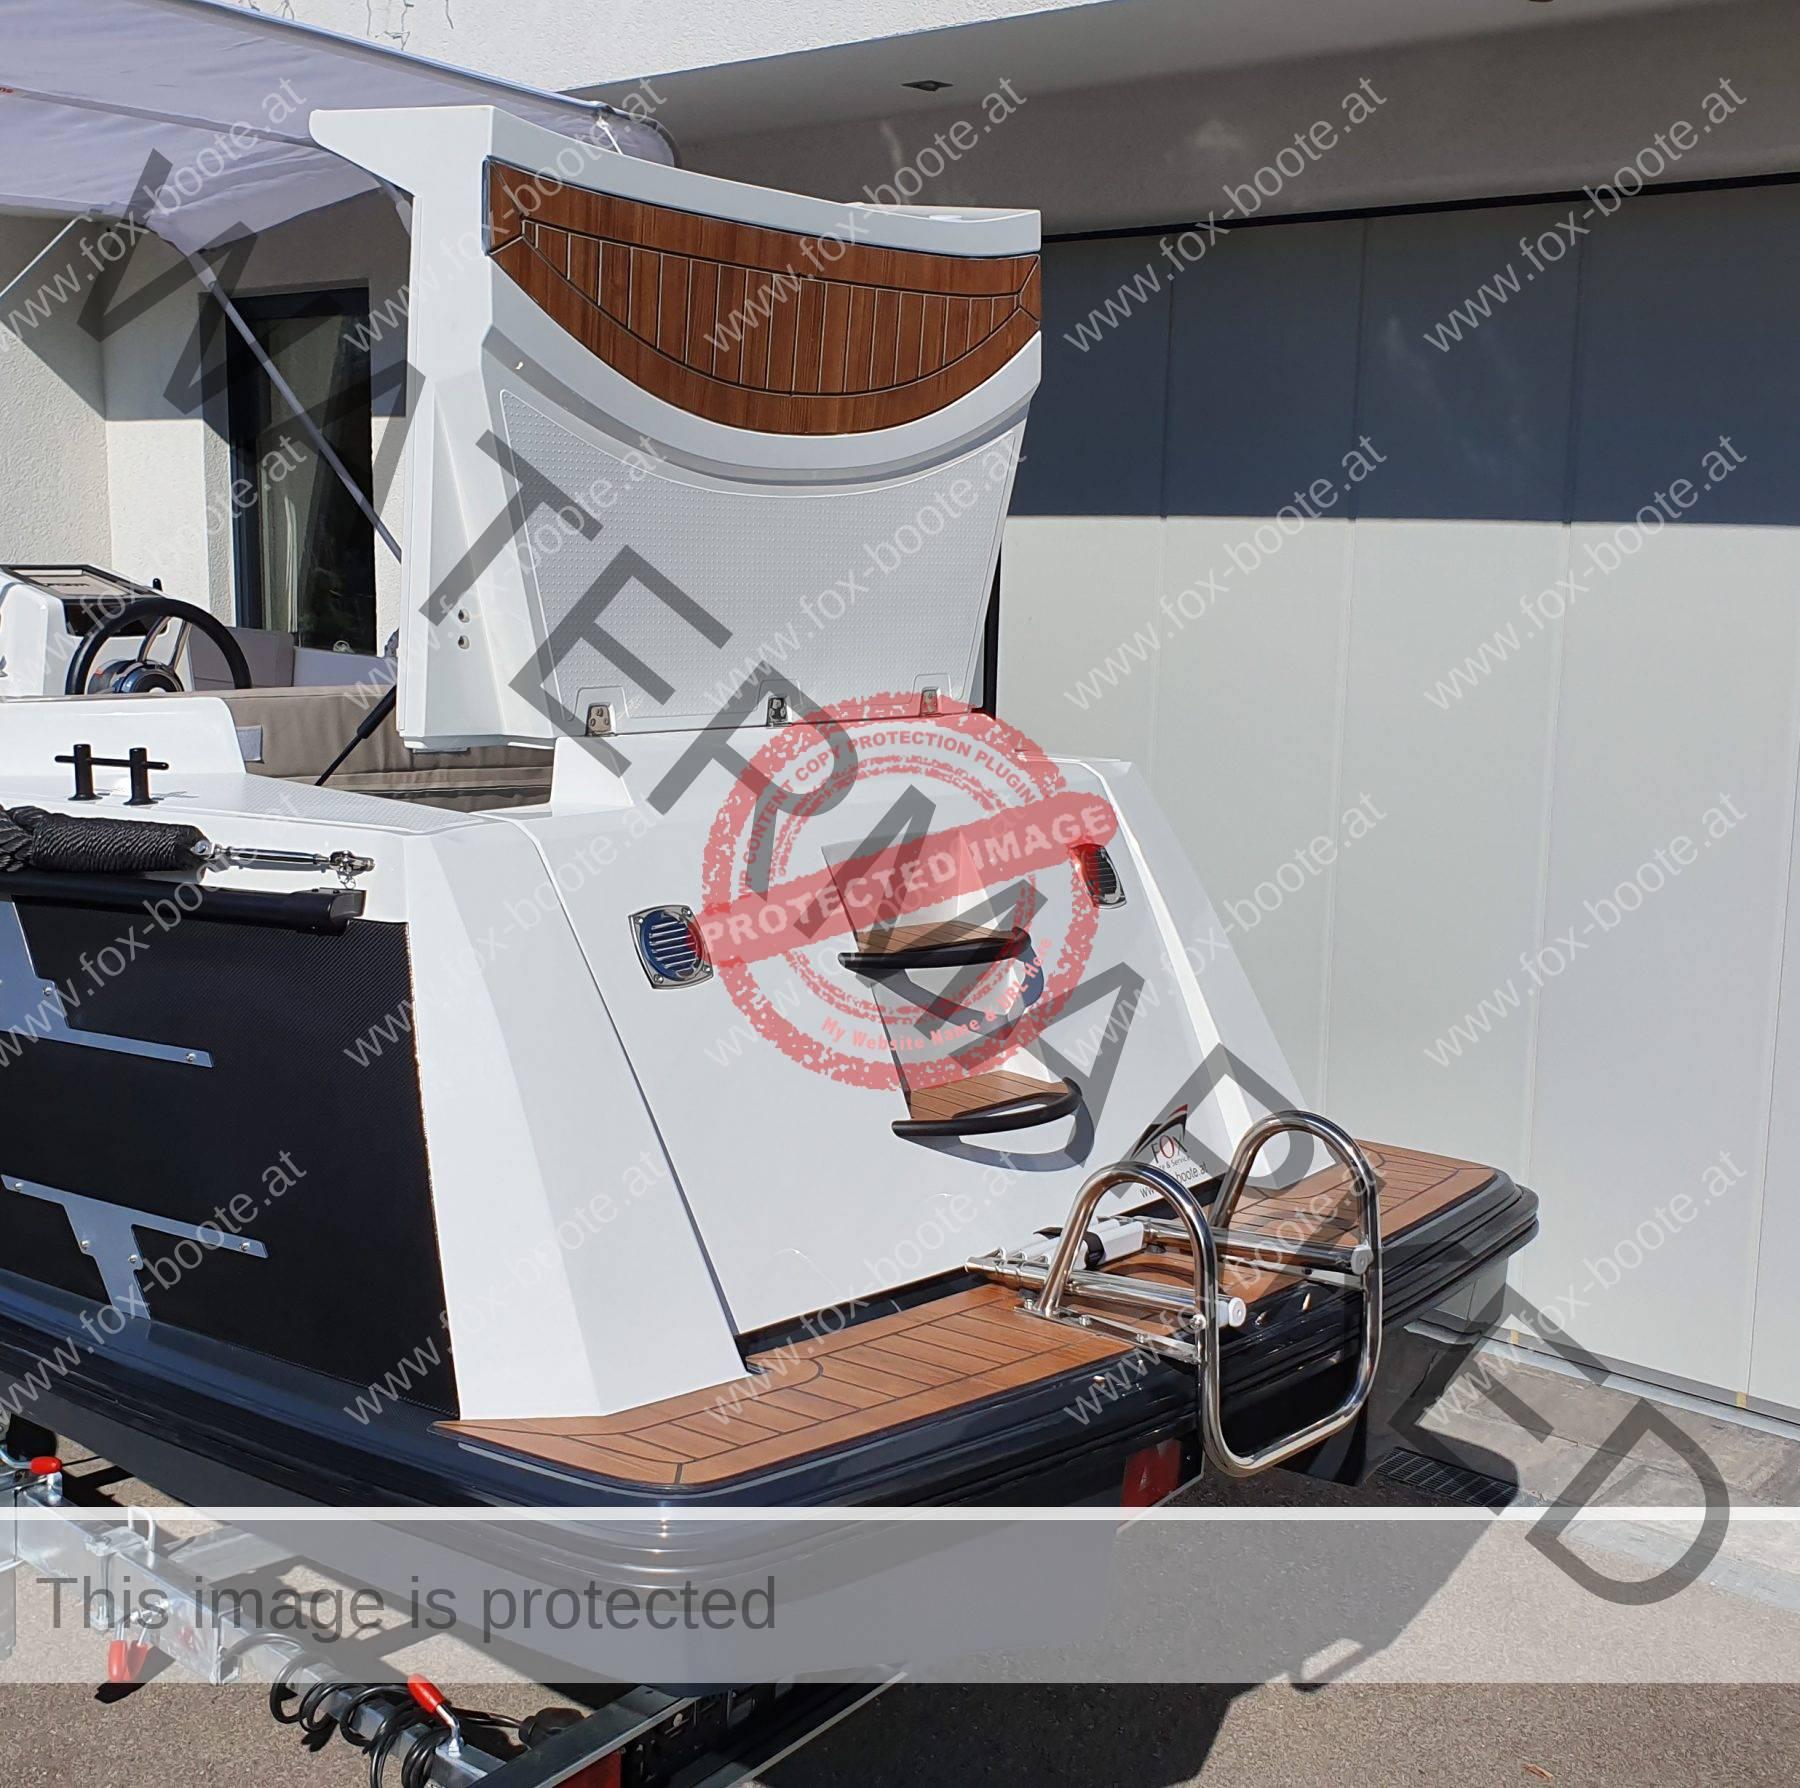 corsiva 595 tender 10